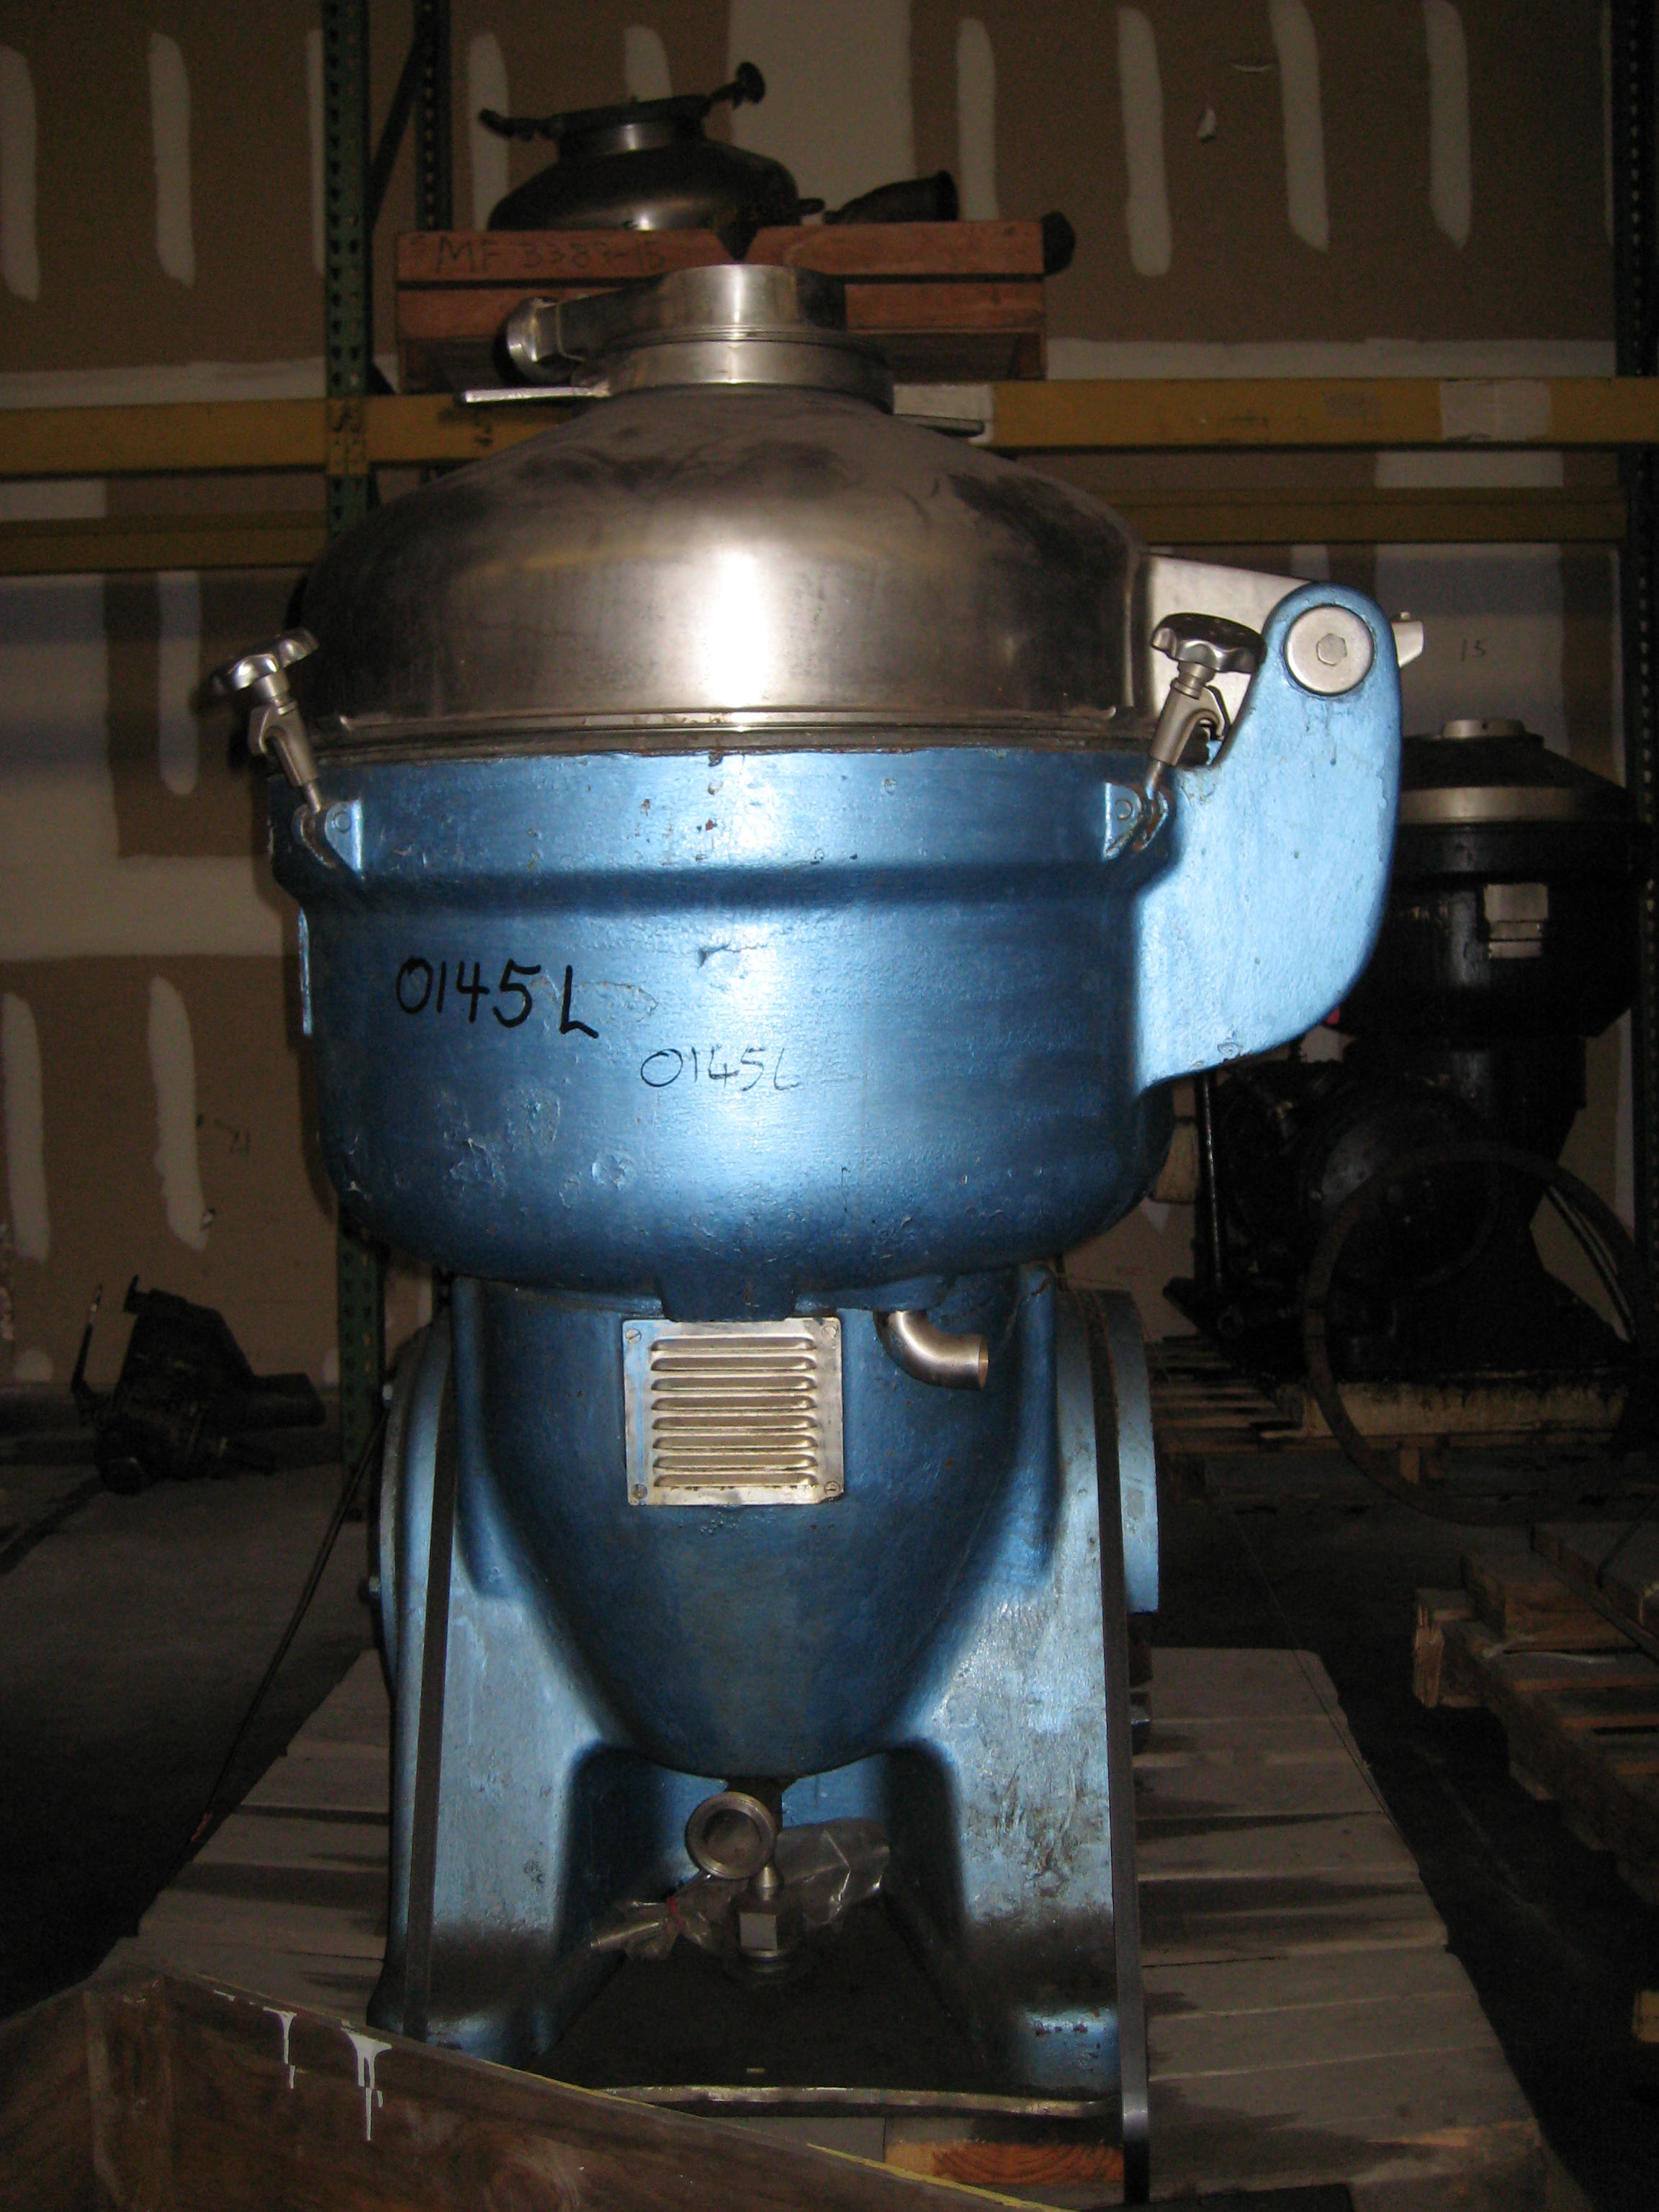 Delaval BRH 214-34 H-12 Disc Centrifuge